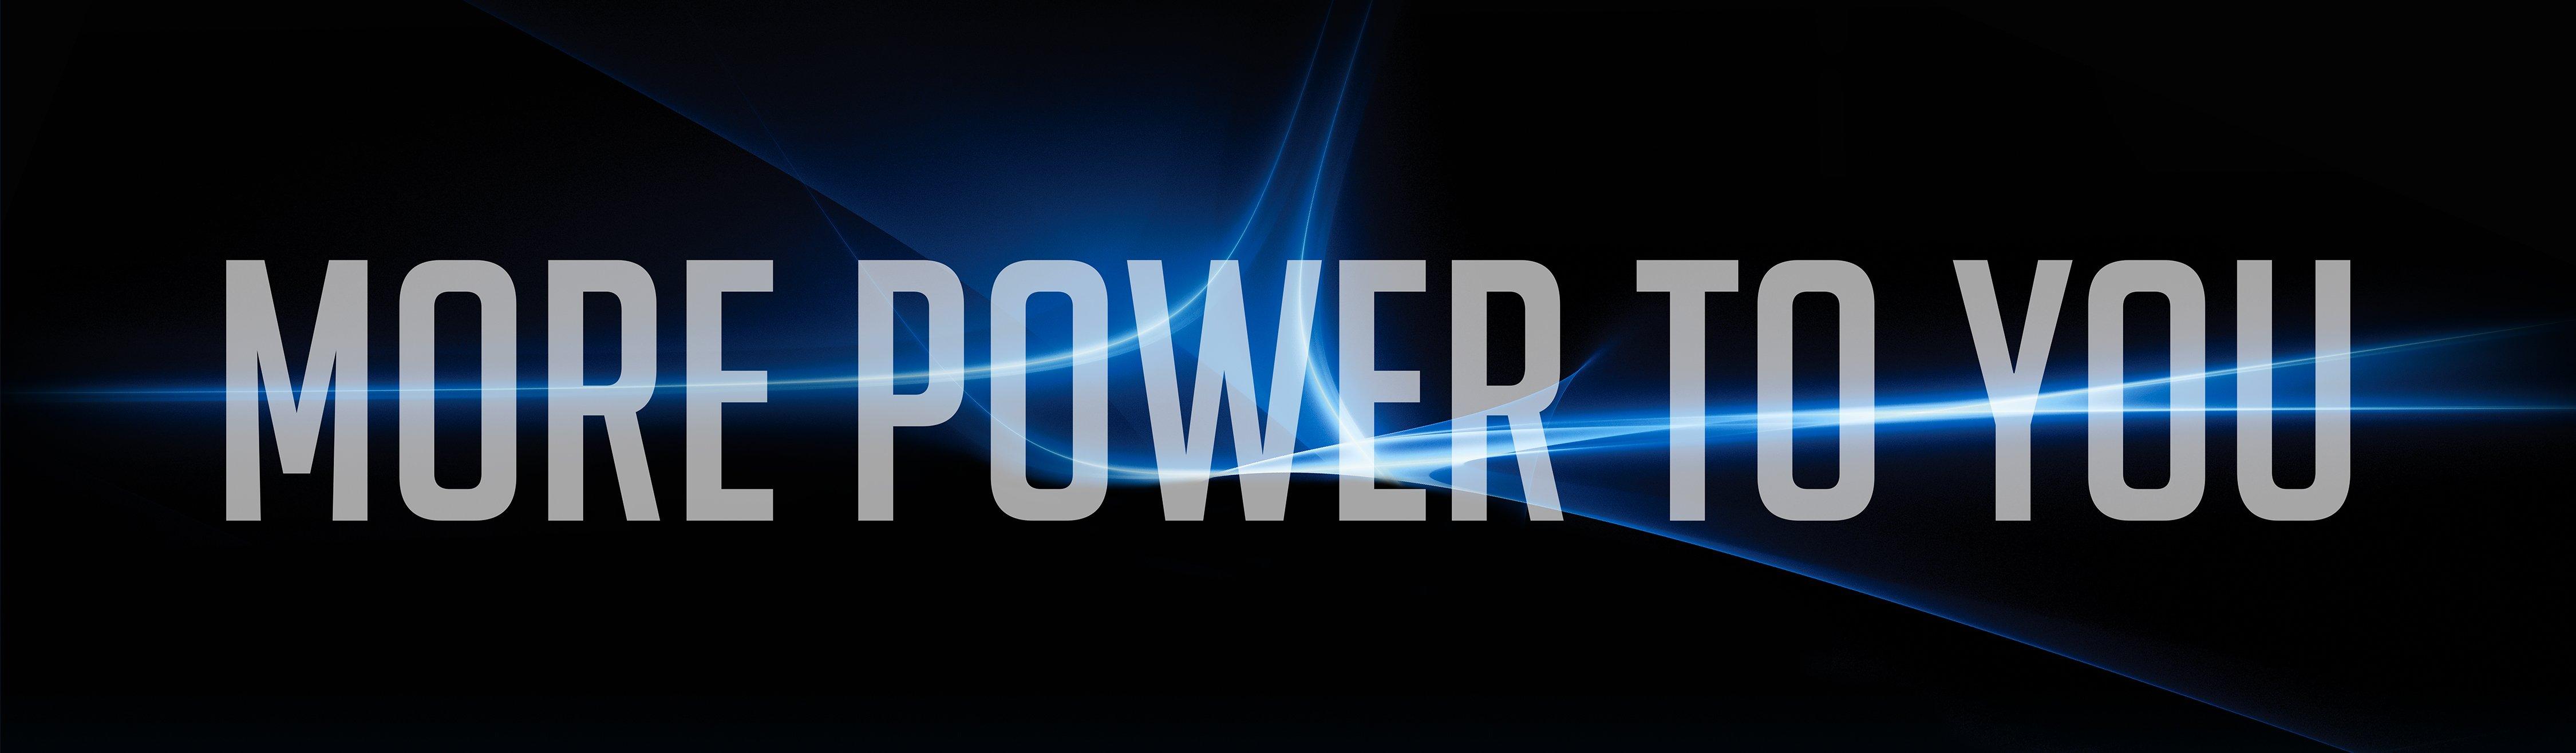 MorePowerToYou-Background